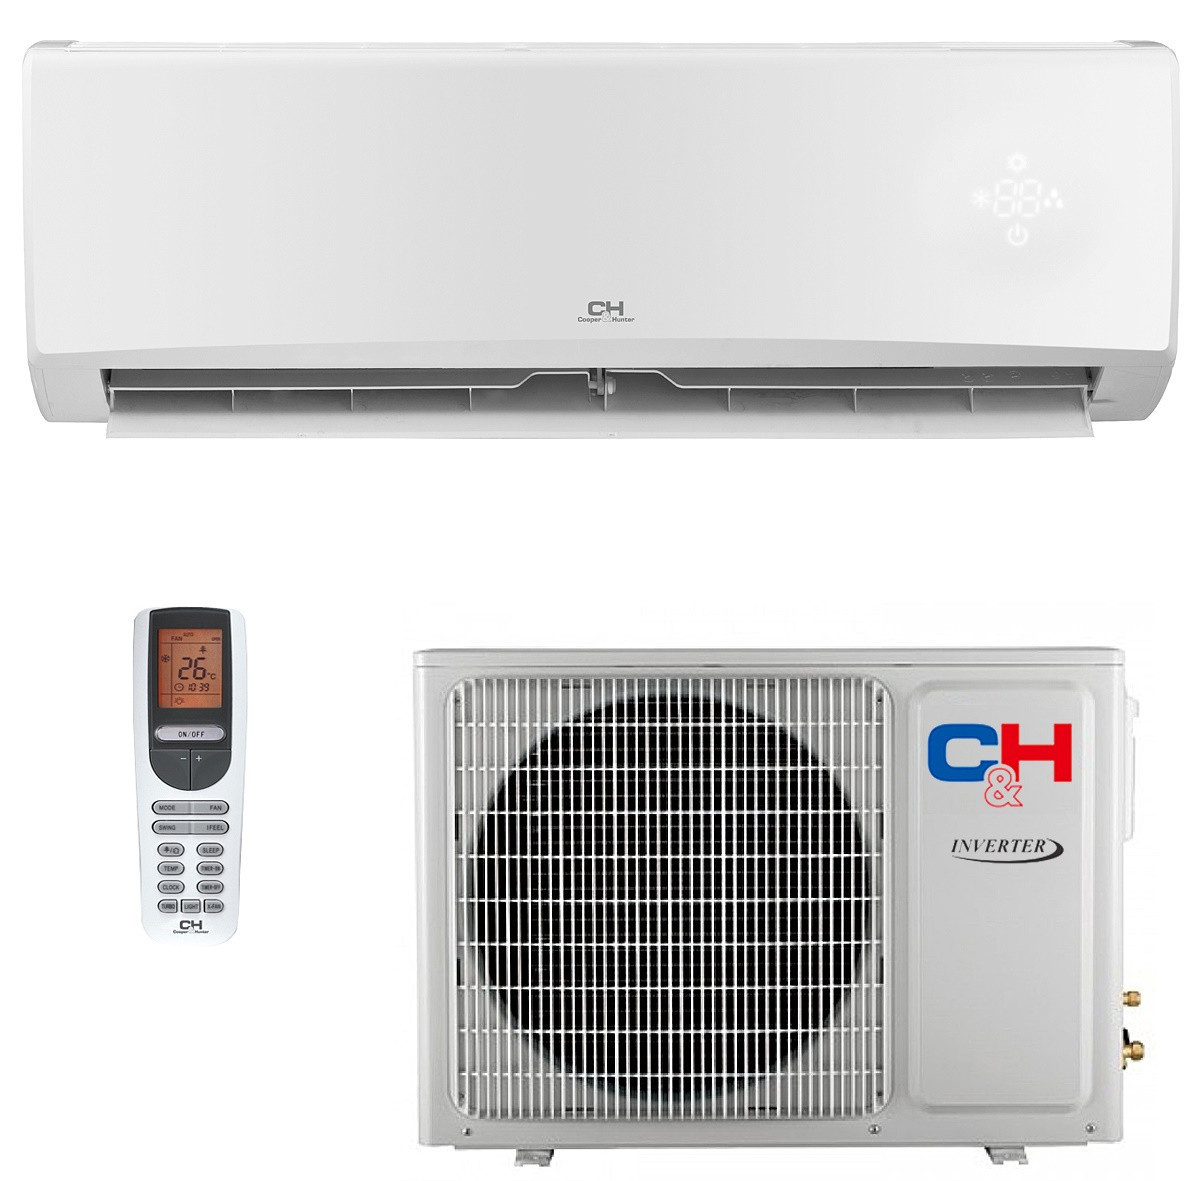 Кондиционер инверторный сплит-система Cooper&Hunter Alpha Inverter CH-S18FTXE-NG R32 Wi-Fi